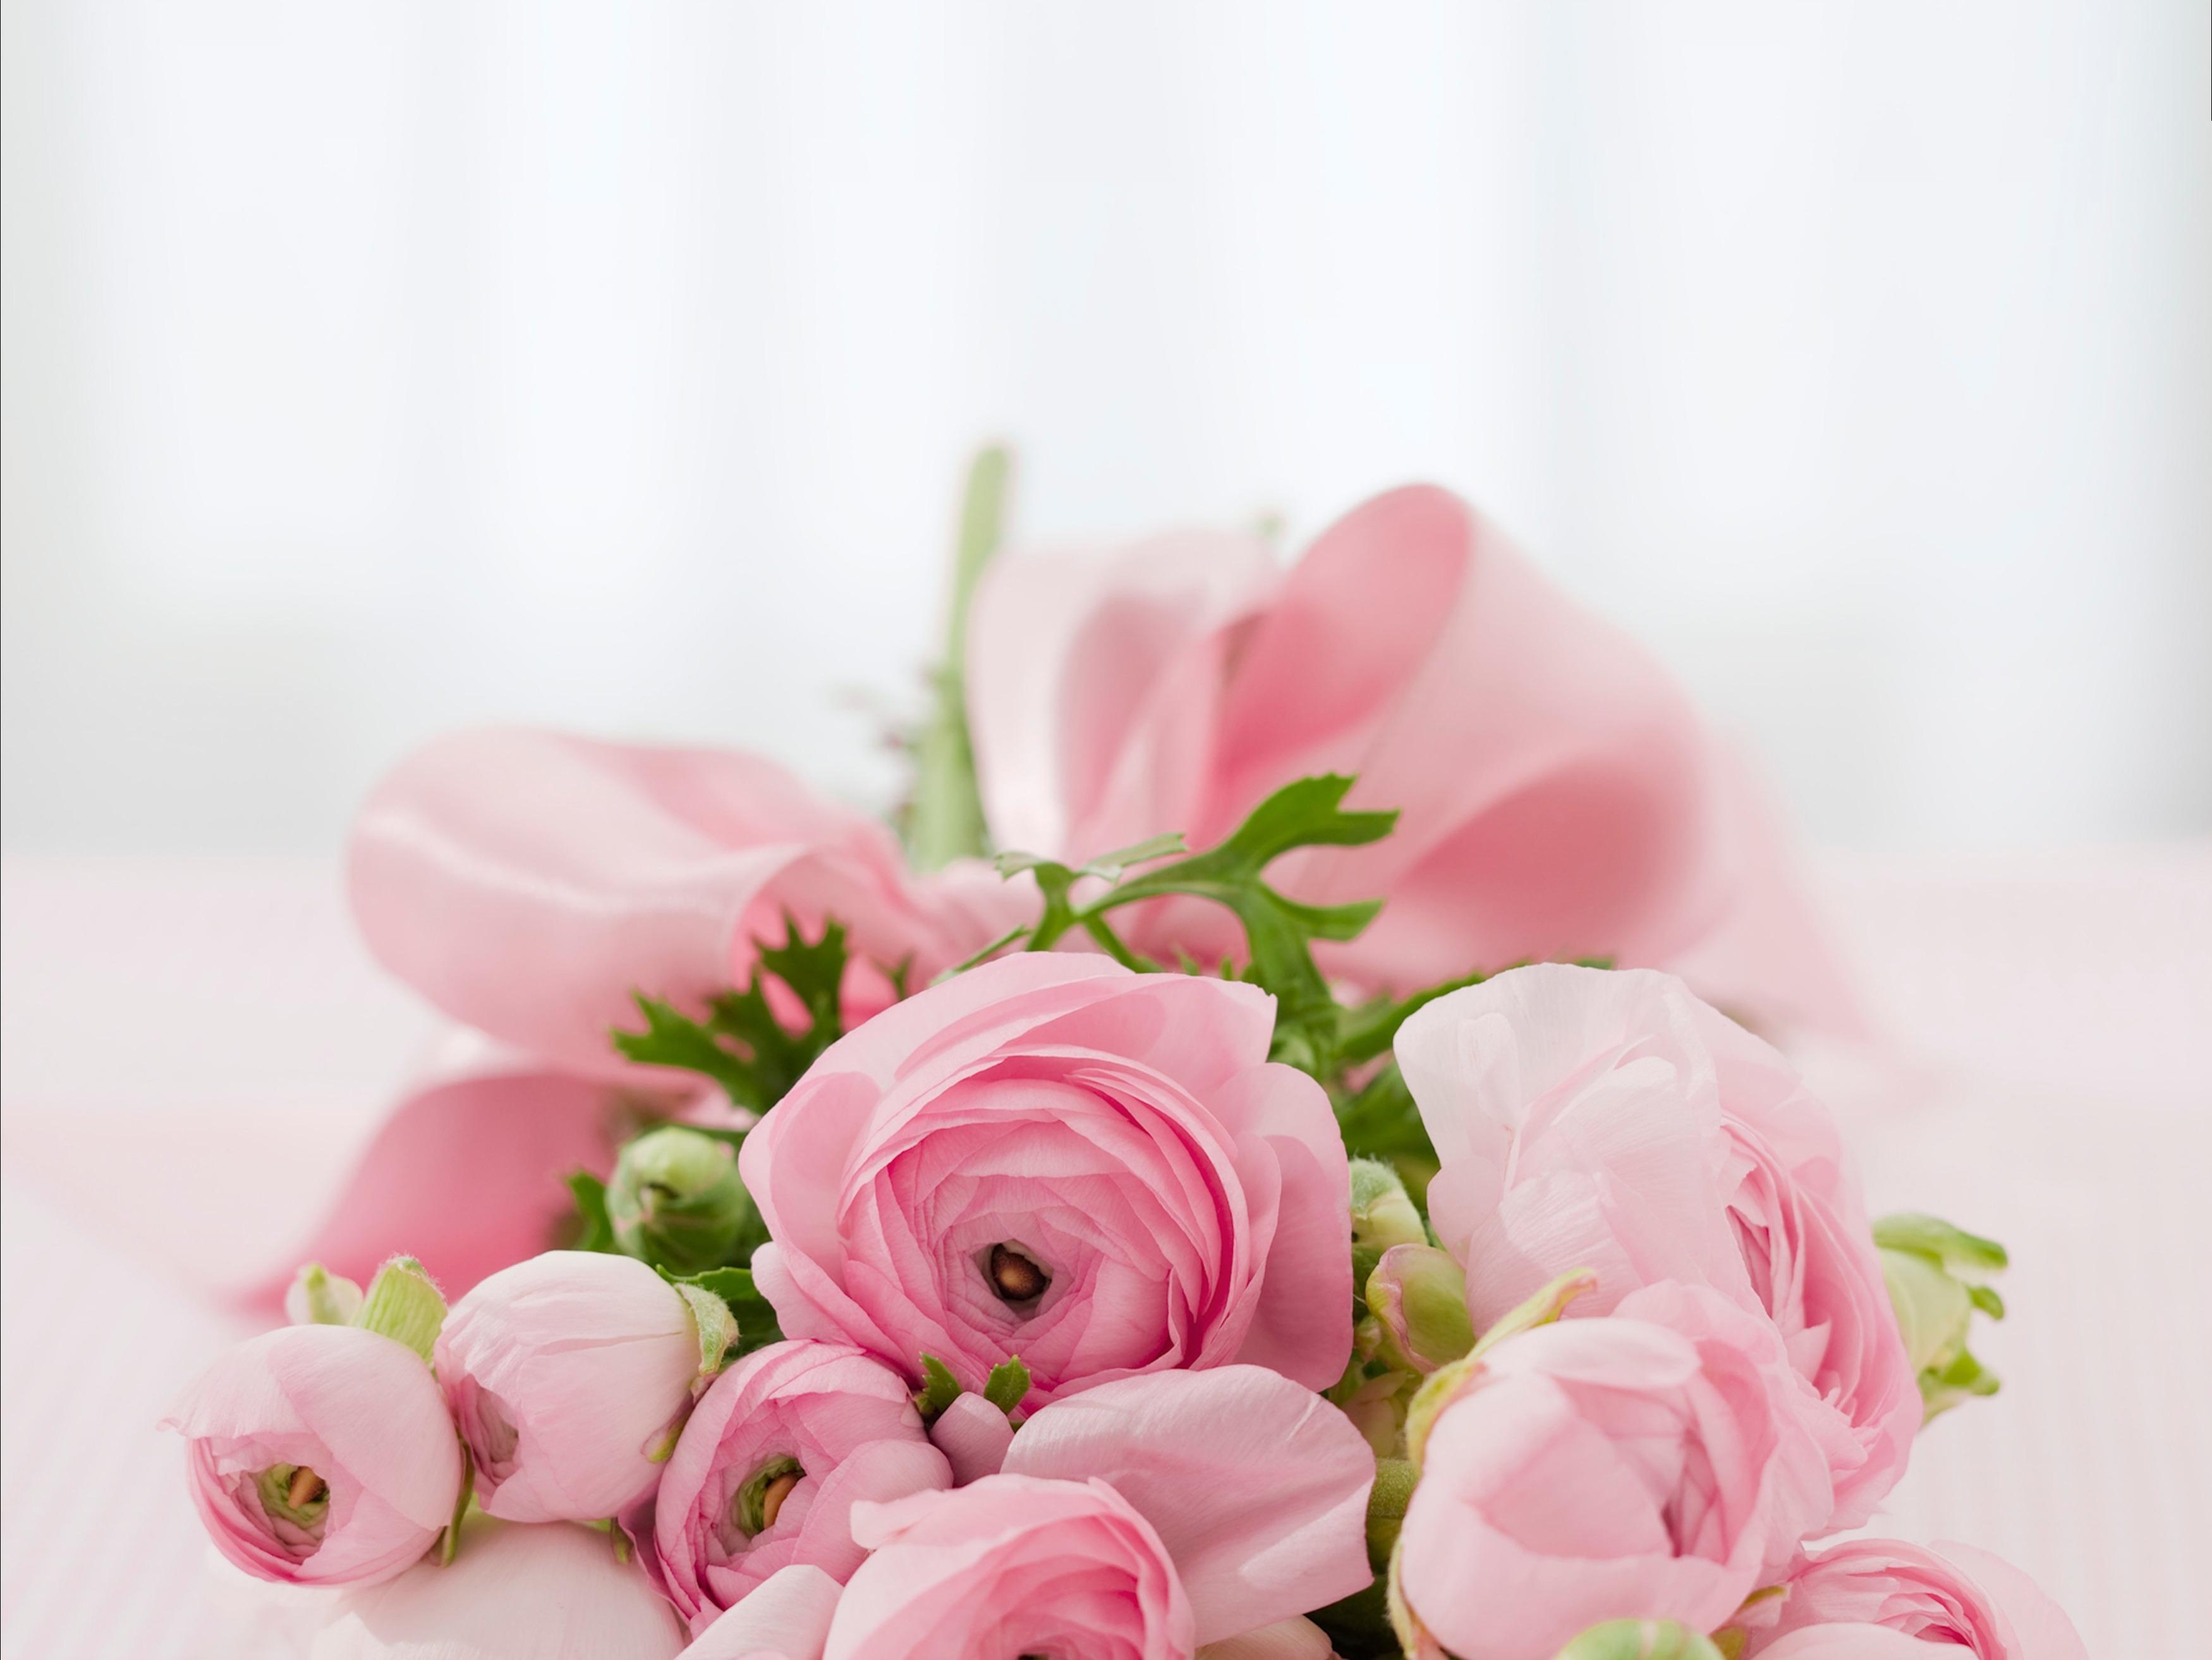 roses-bouquet-congratulations-arrangement-68570.jpeg (3500×2626)